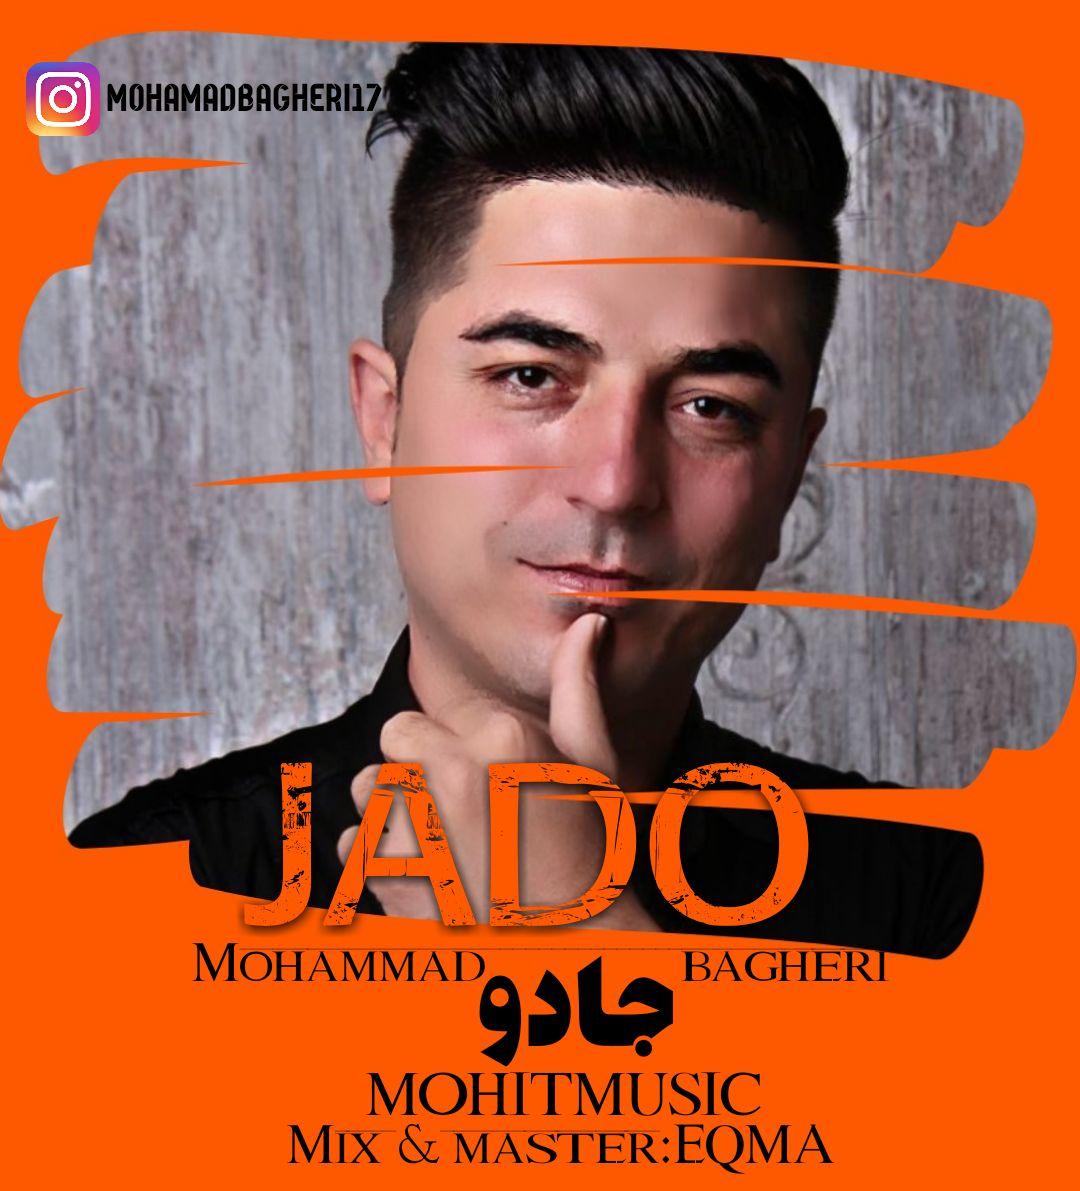 Mohamad Bagheri – Jadoo